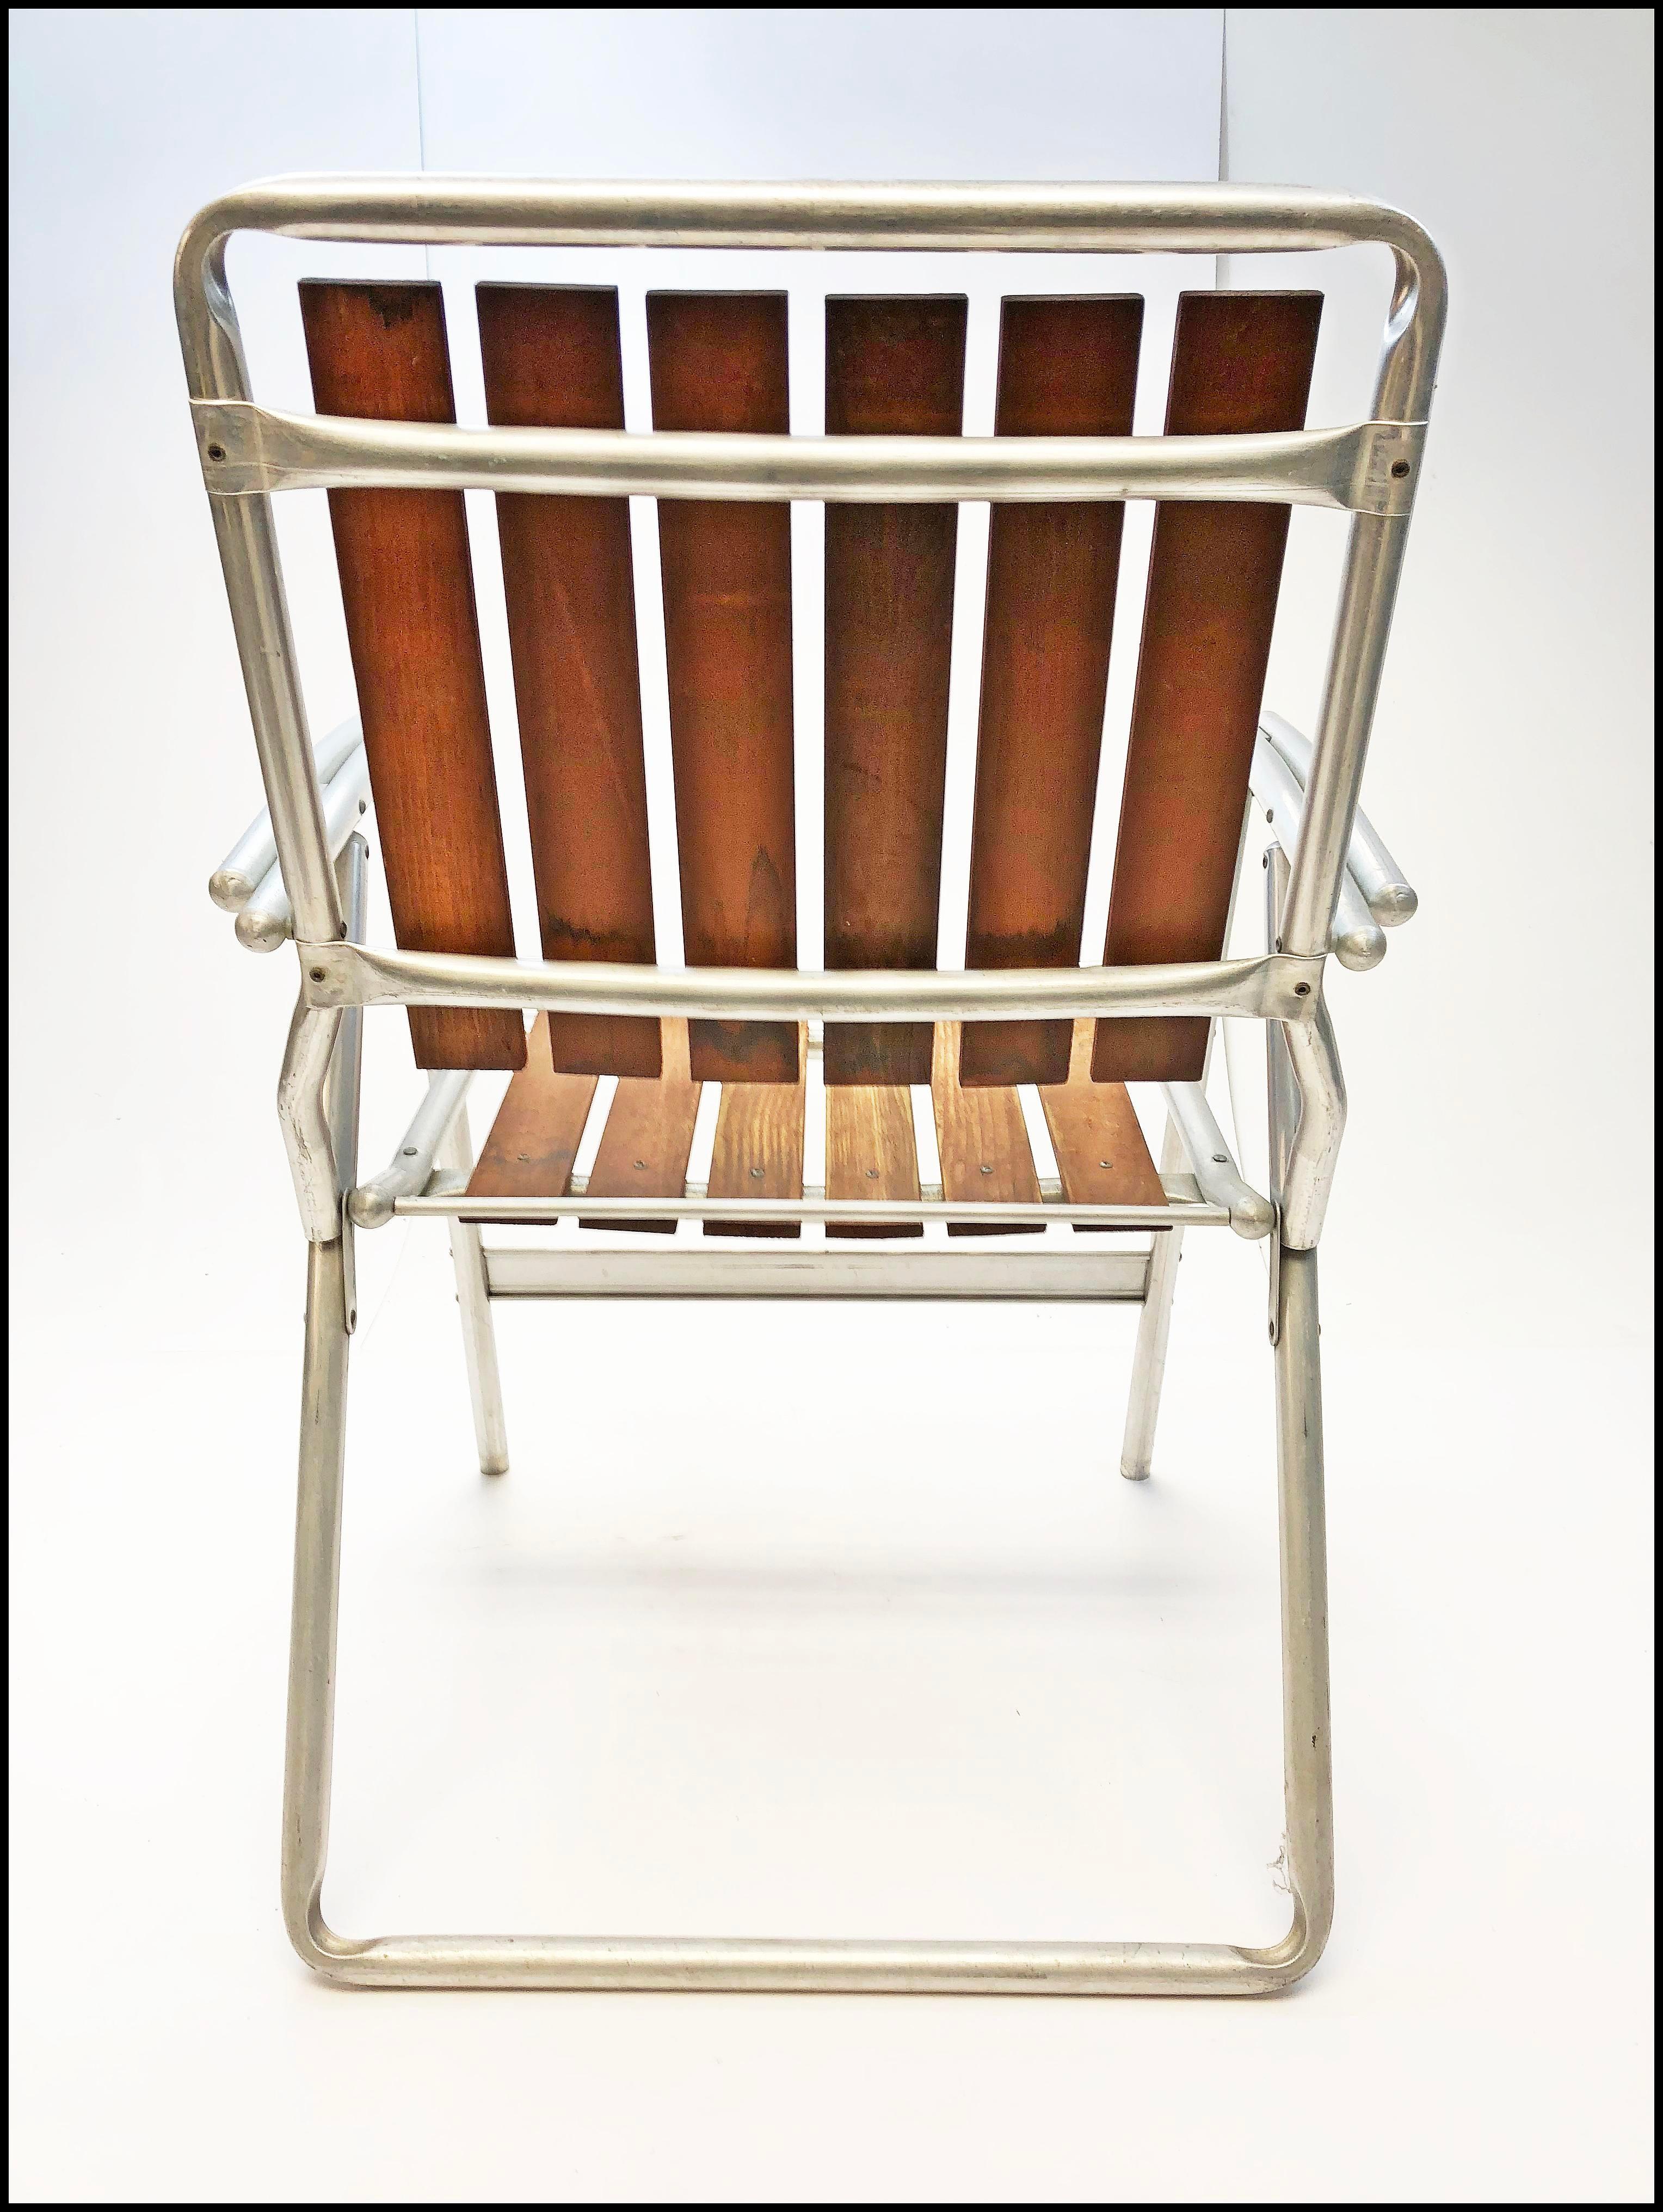 Vintage Redwood U0026 Aluminum Folding Patio Chair   Image 10 Of 13